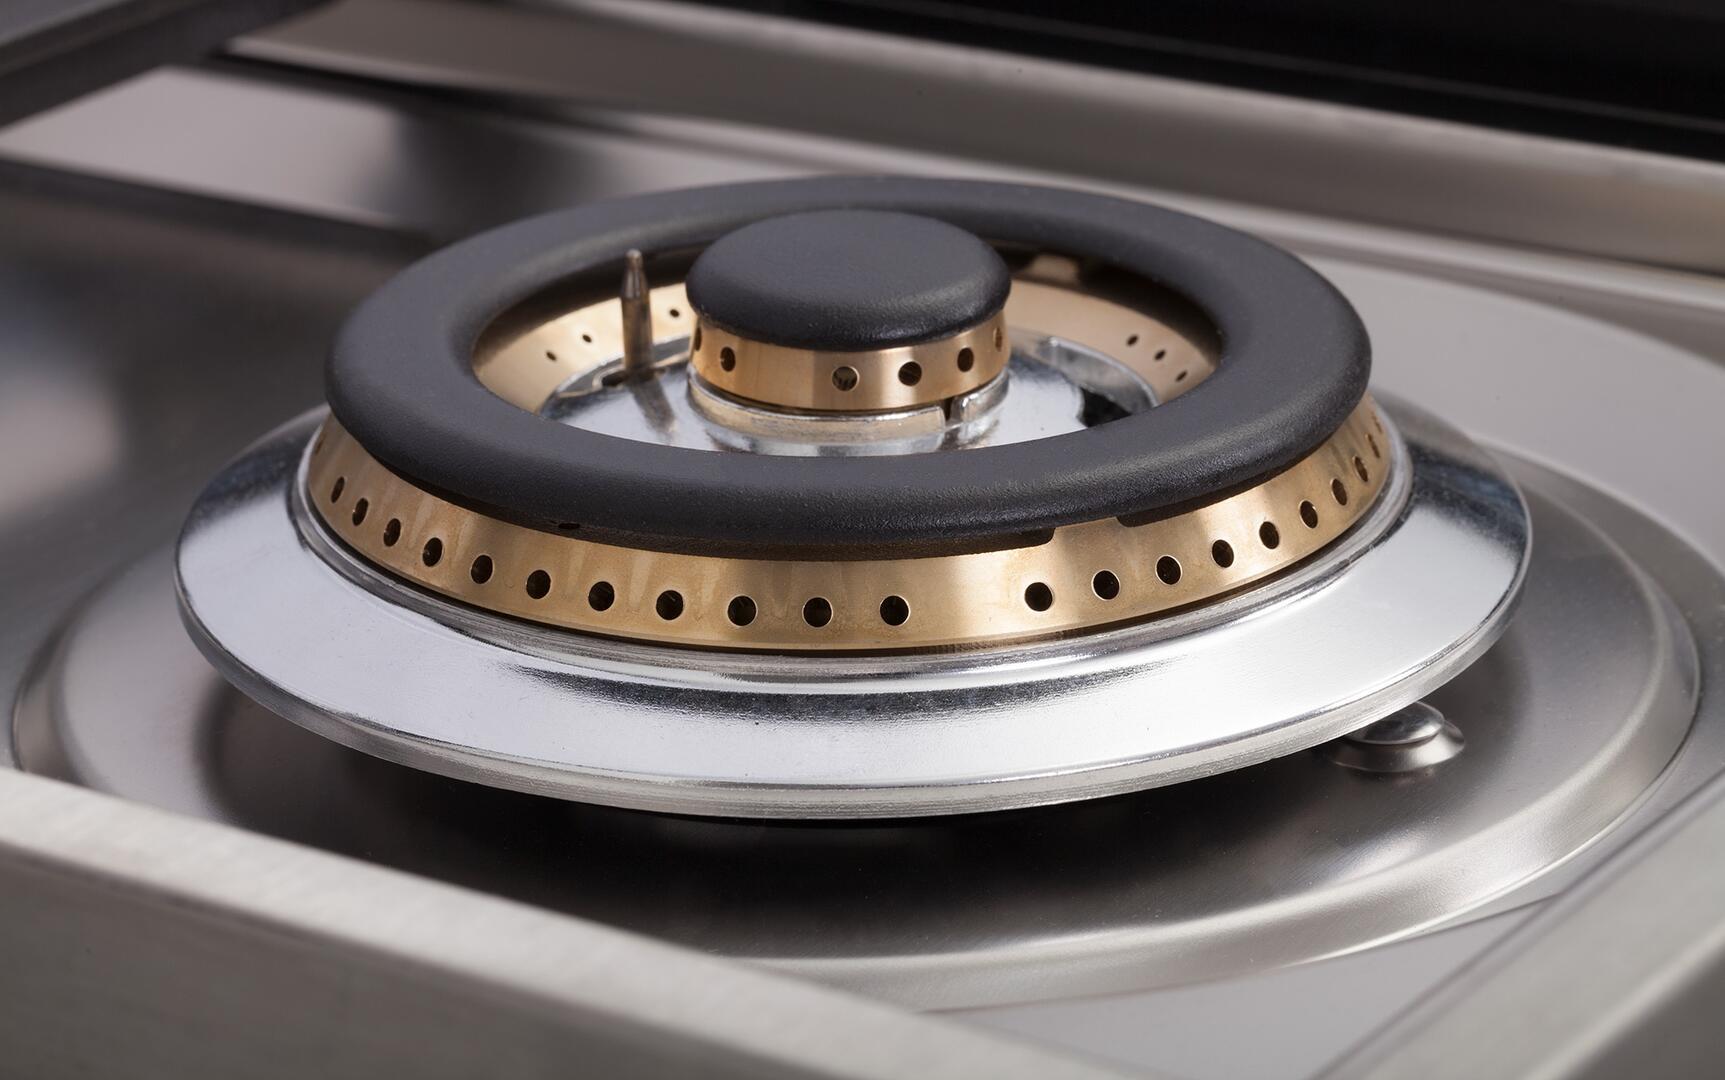 Ilve Professional Plus UPDW100FDMPM Freestanding Dual Fuel Range Gray, 15